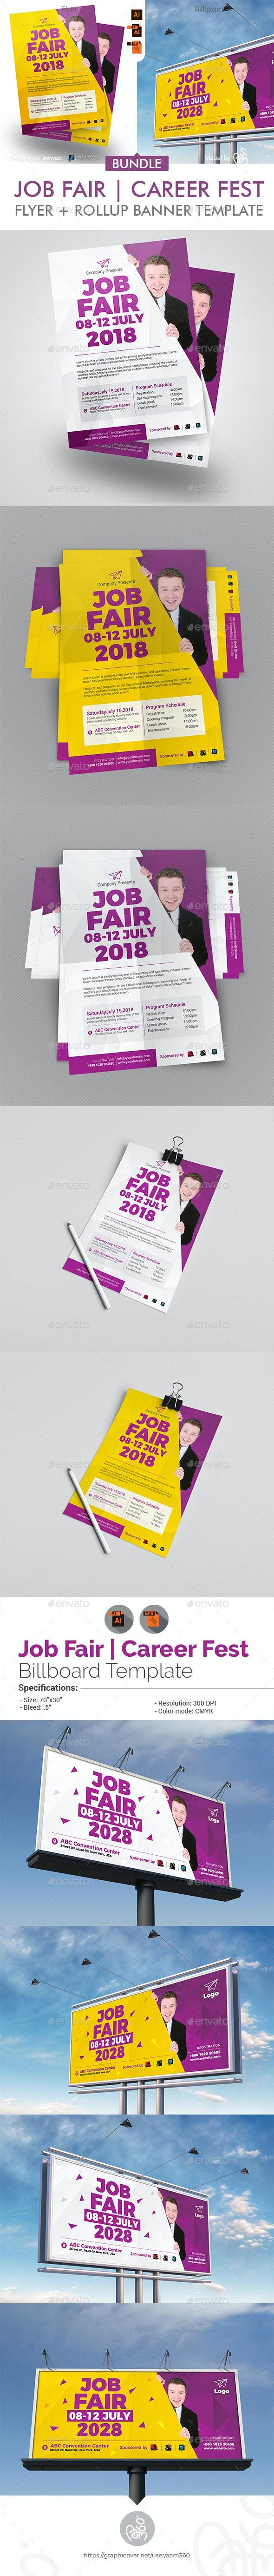 Job Fair Flyer + Billboard Bundle - Events Flyers